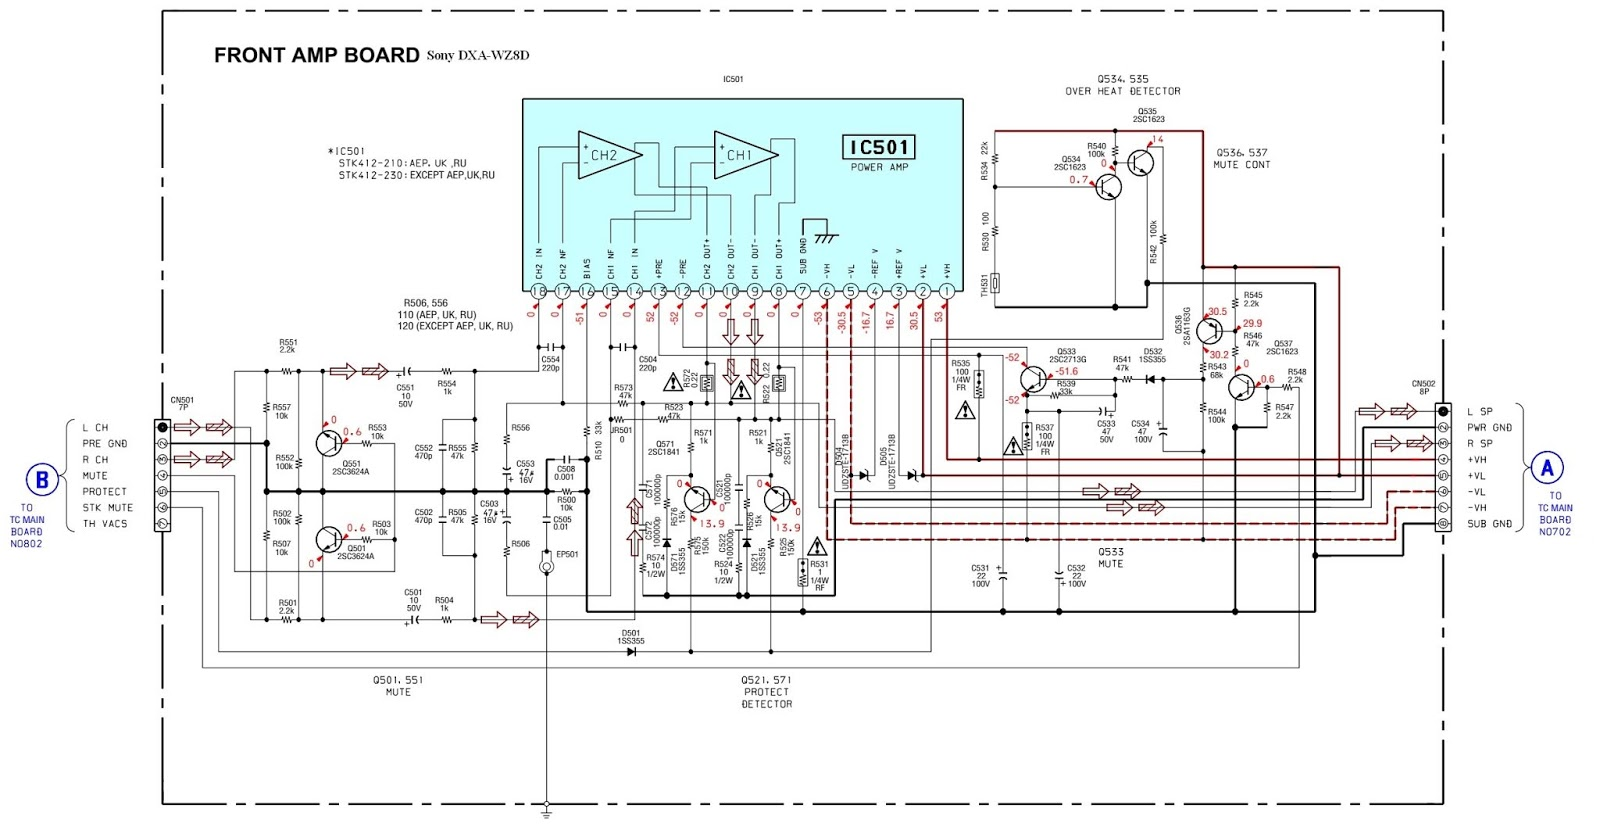 sony dxa wz8d front amplifier board circuit diagram [ 1600 x 838 Pixel ]